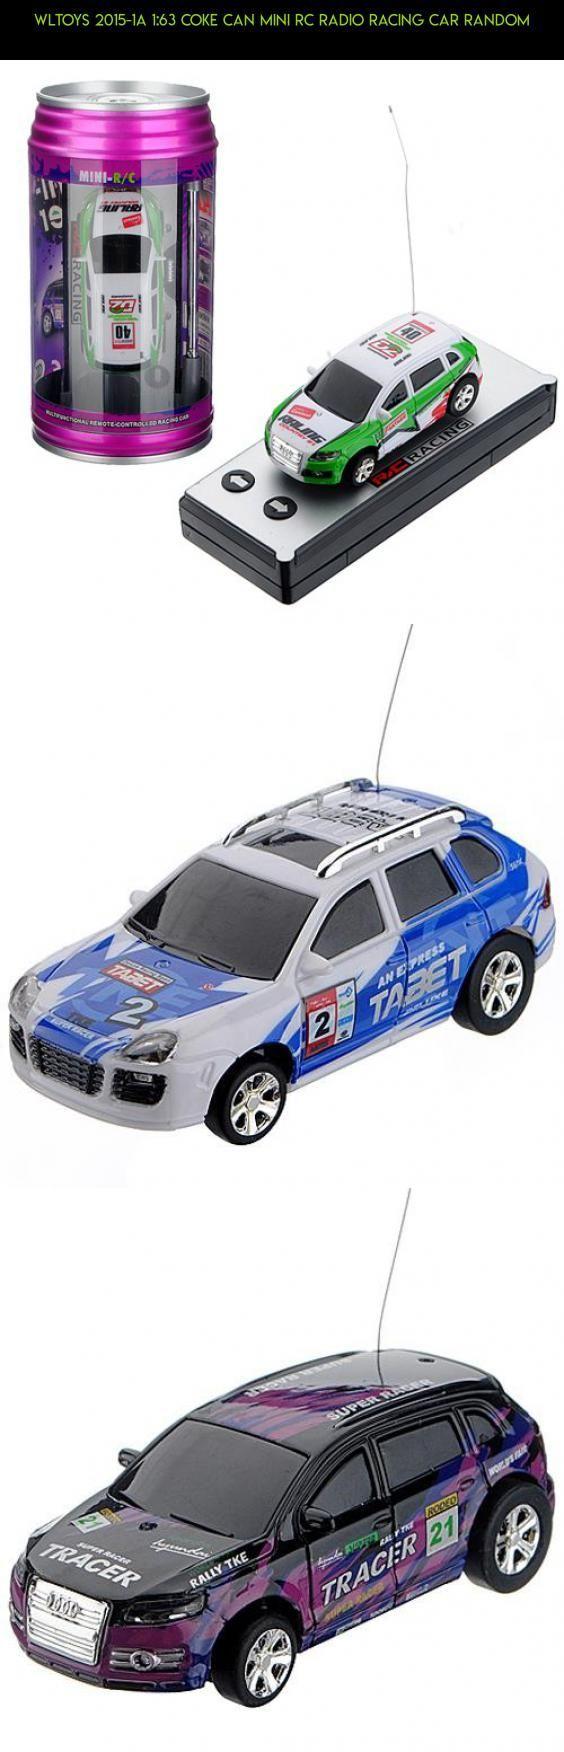 Wltoys 2015-1A 1:63 Coke Can Mini RC Radio Racing Car Random #camera #mini #wltoys #fpv #gadgets #tech #products #plans #kit #racing #rc #parts #shopping #drone #car #technology